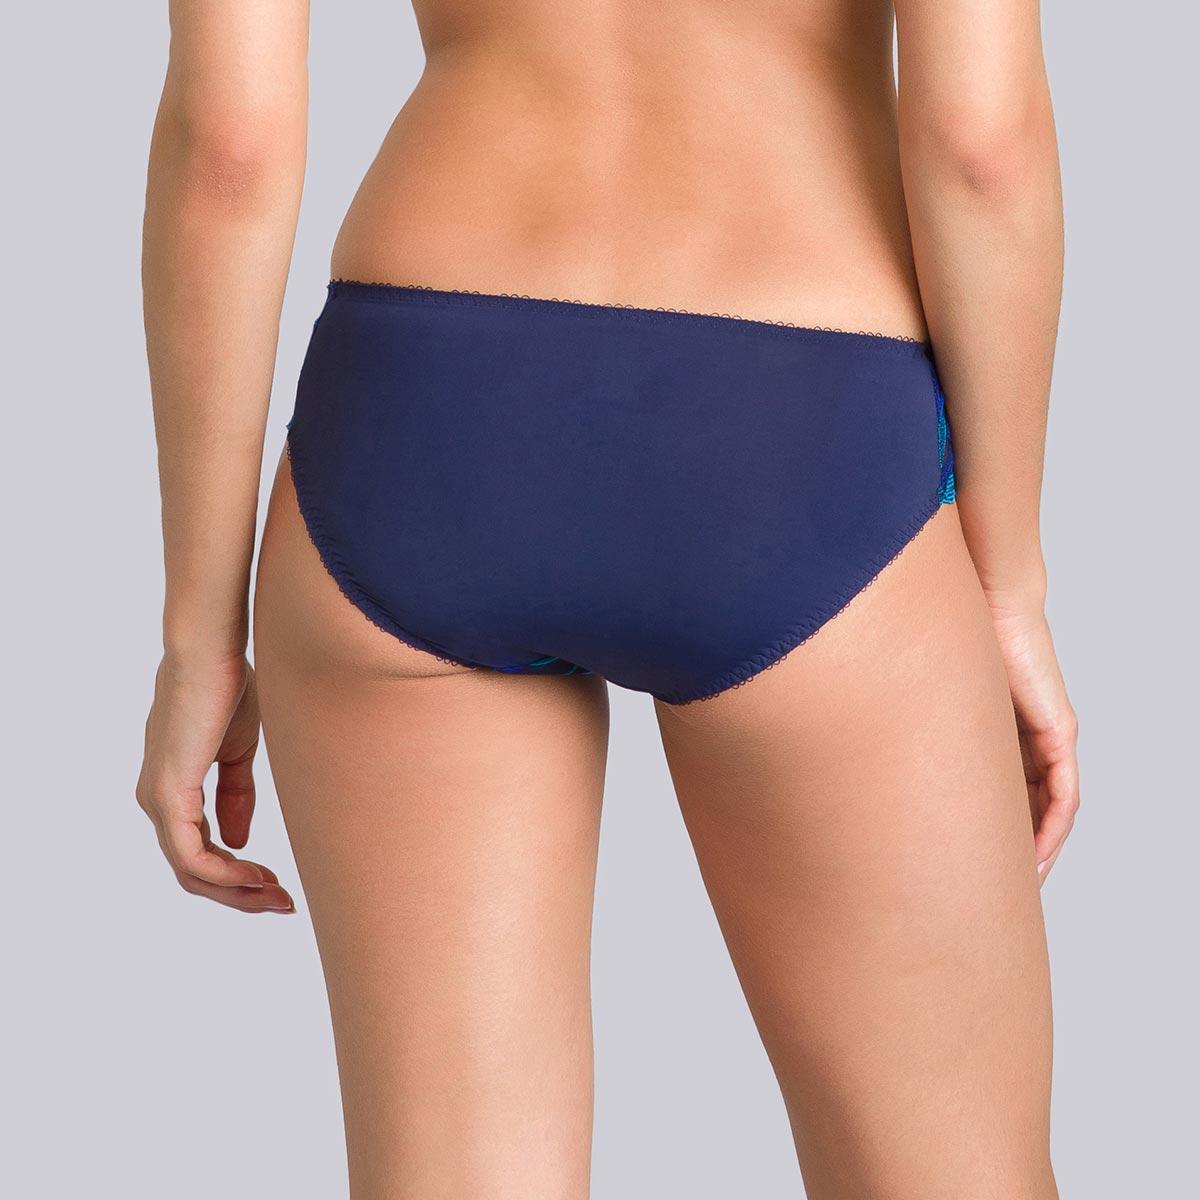 Slip mini blu stampato verde - Daily Elegance - PLAYTEX